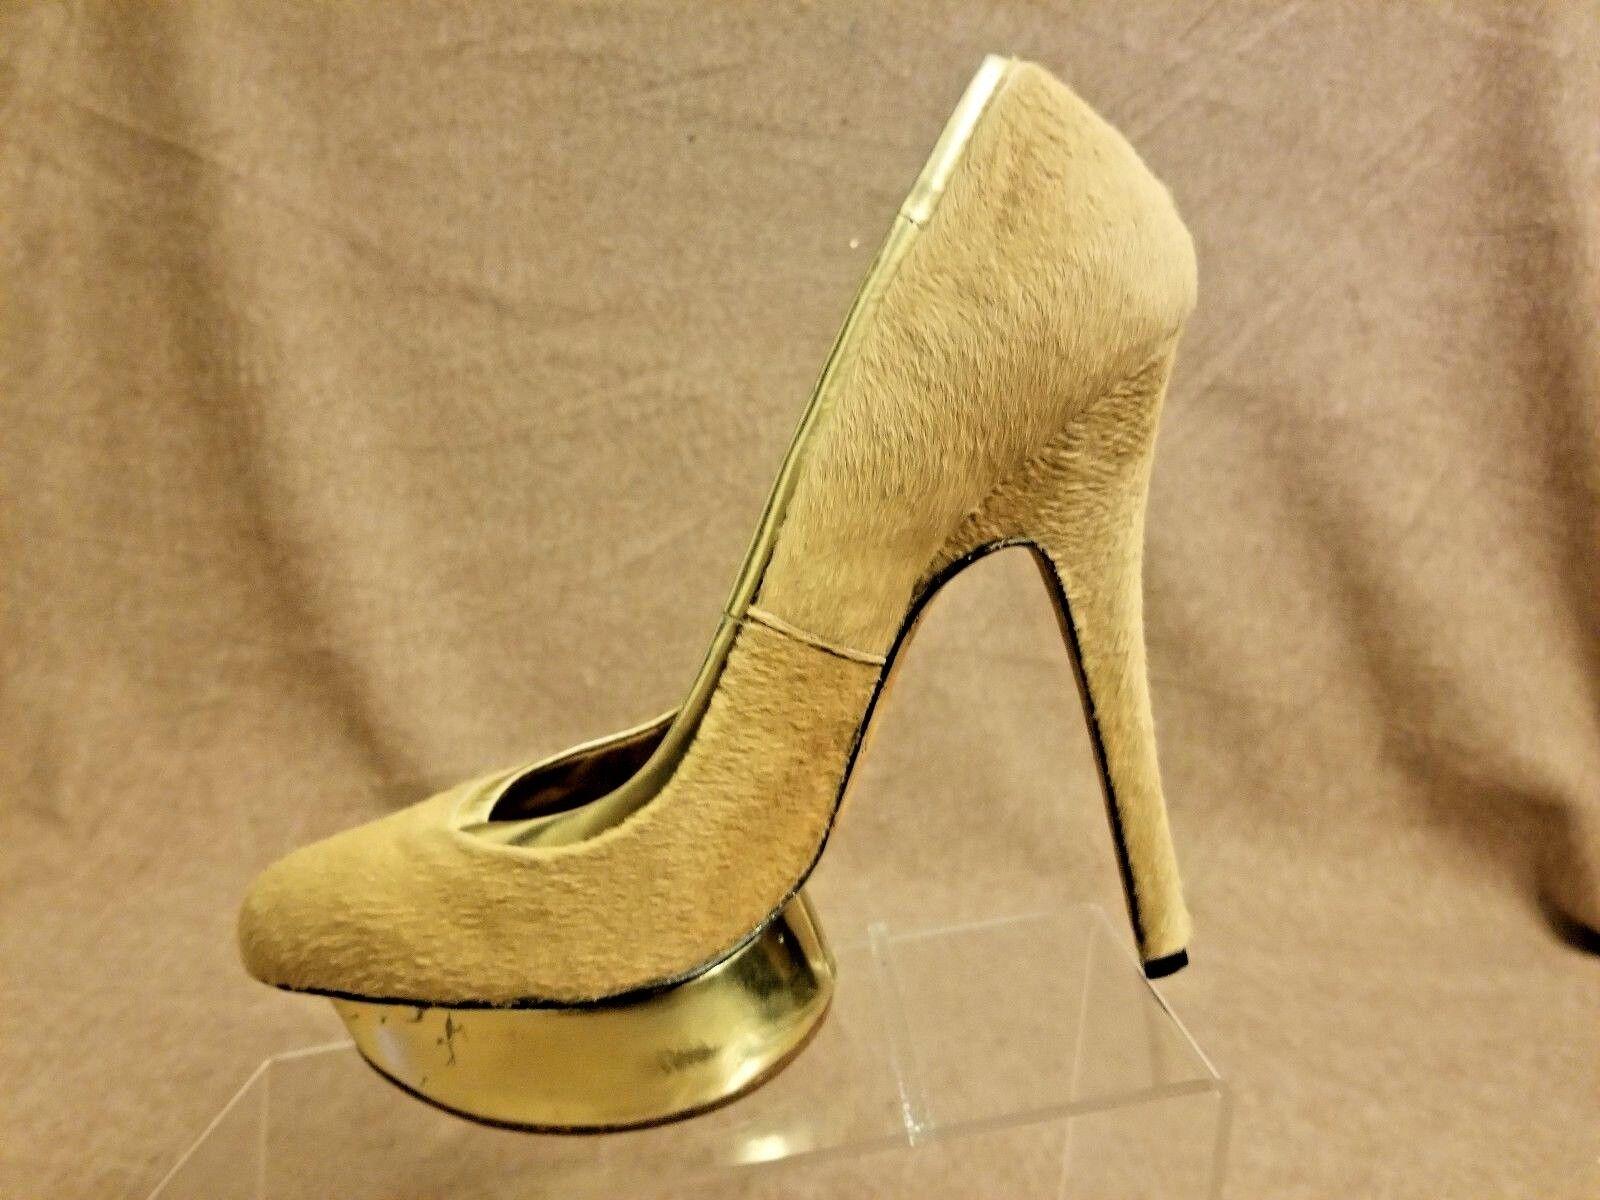 L.A.M.B Damens Tan Nude Platform High Pumps Calf Hair Stiletto High Platform Heels Größe 10 M 16db83